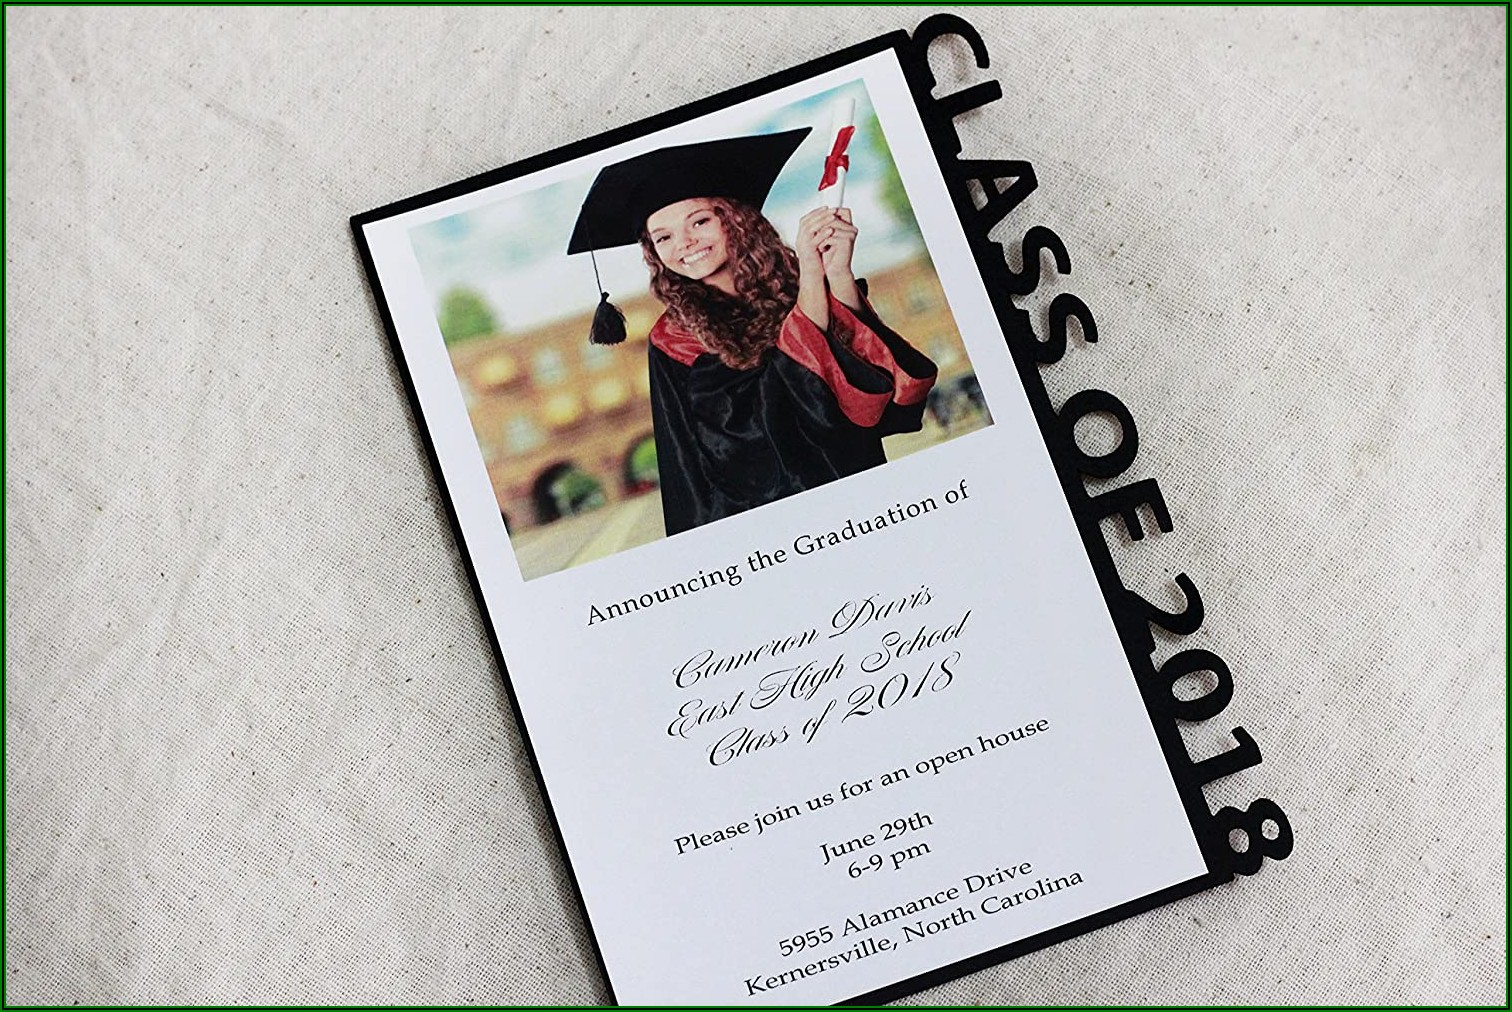 Is A Graduation Announcement The Same As An Invitation